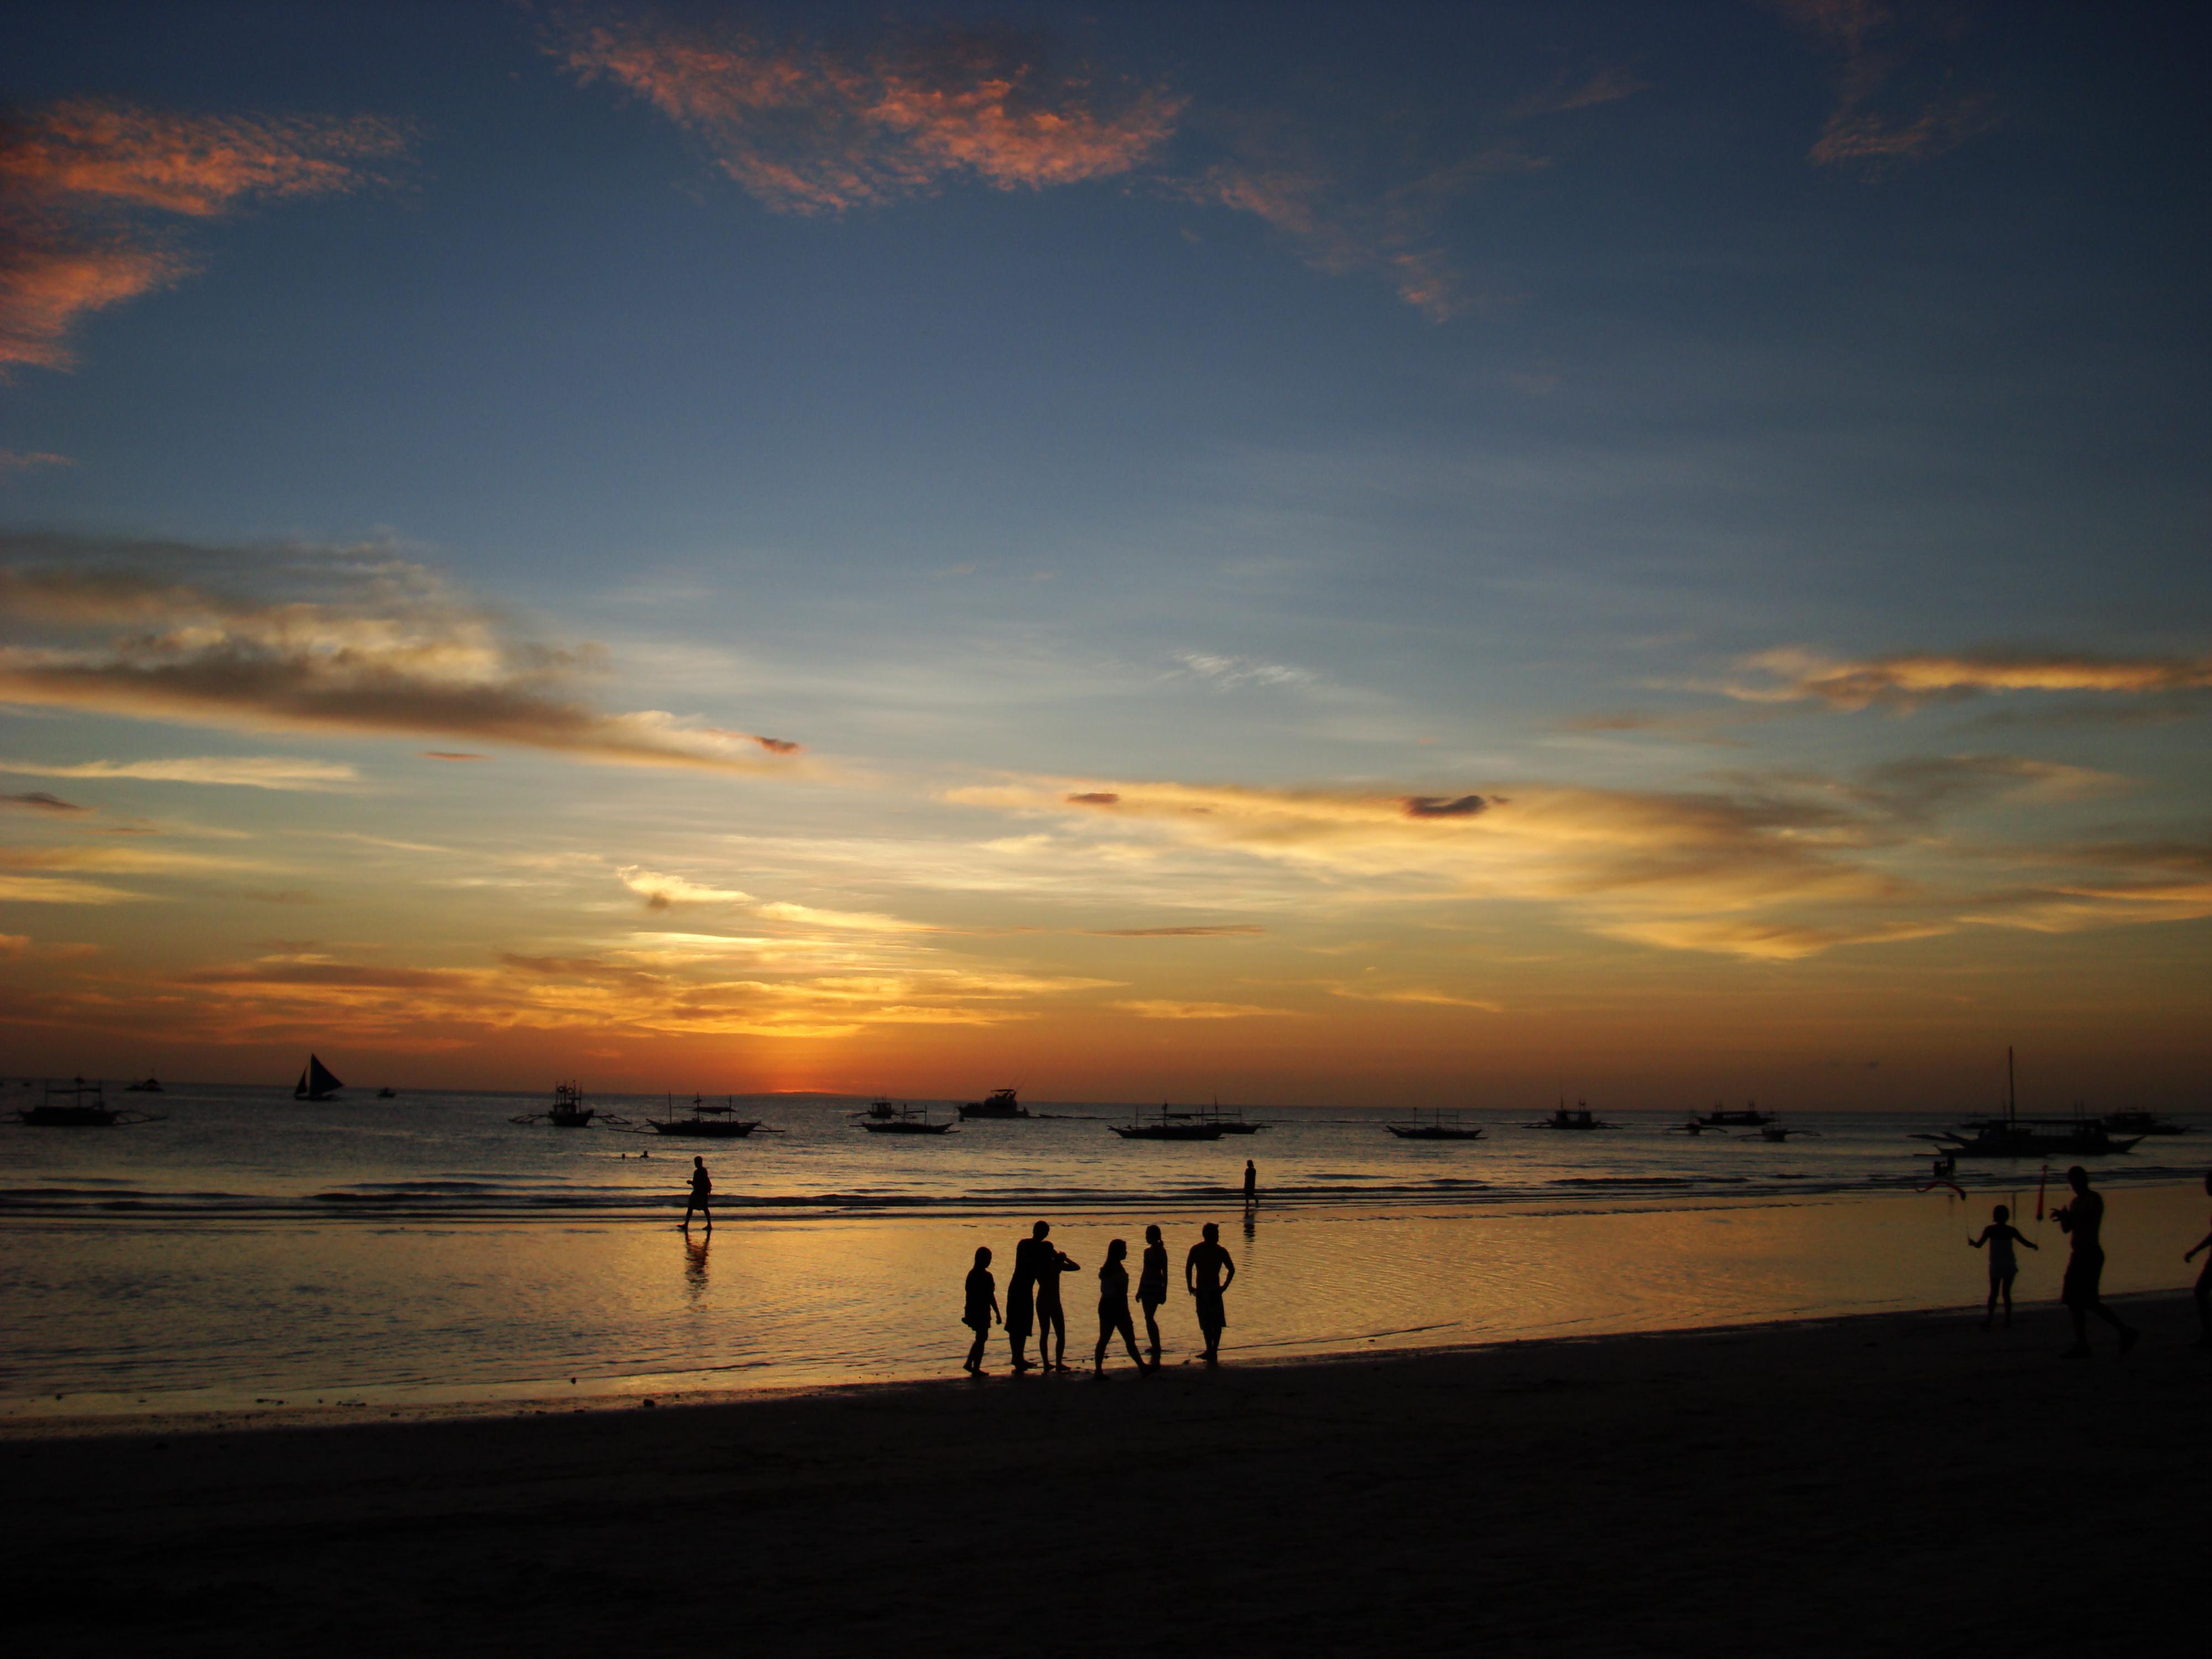 Sunset Philippines Boracay Beach 06